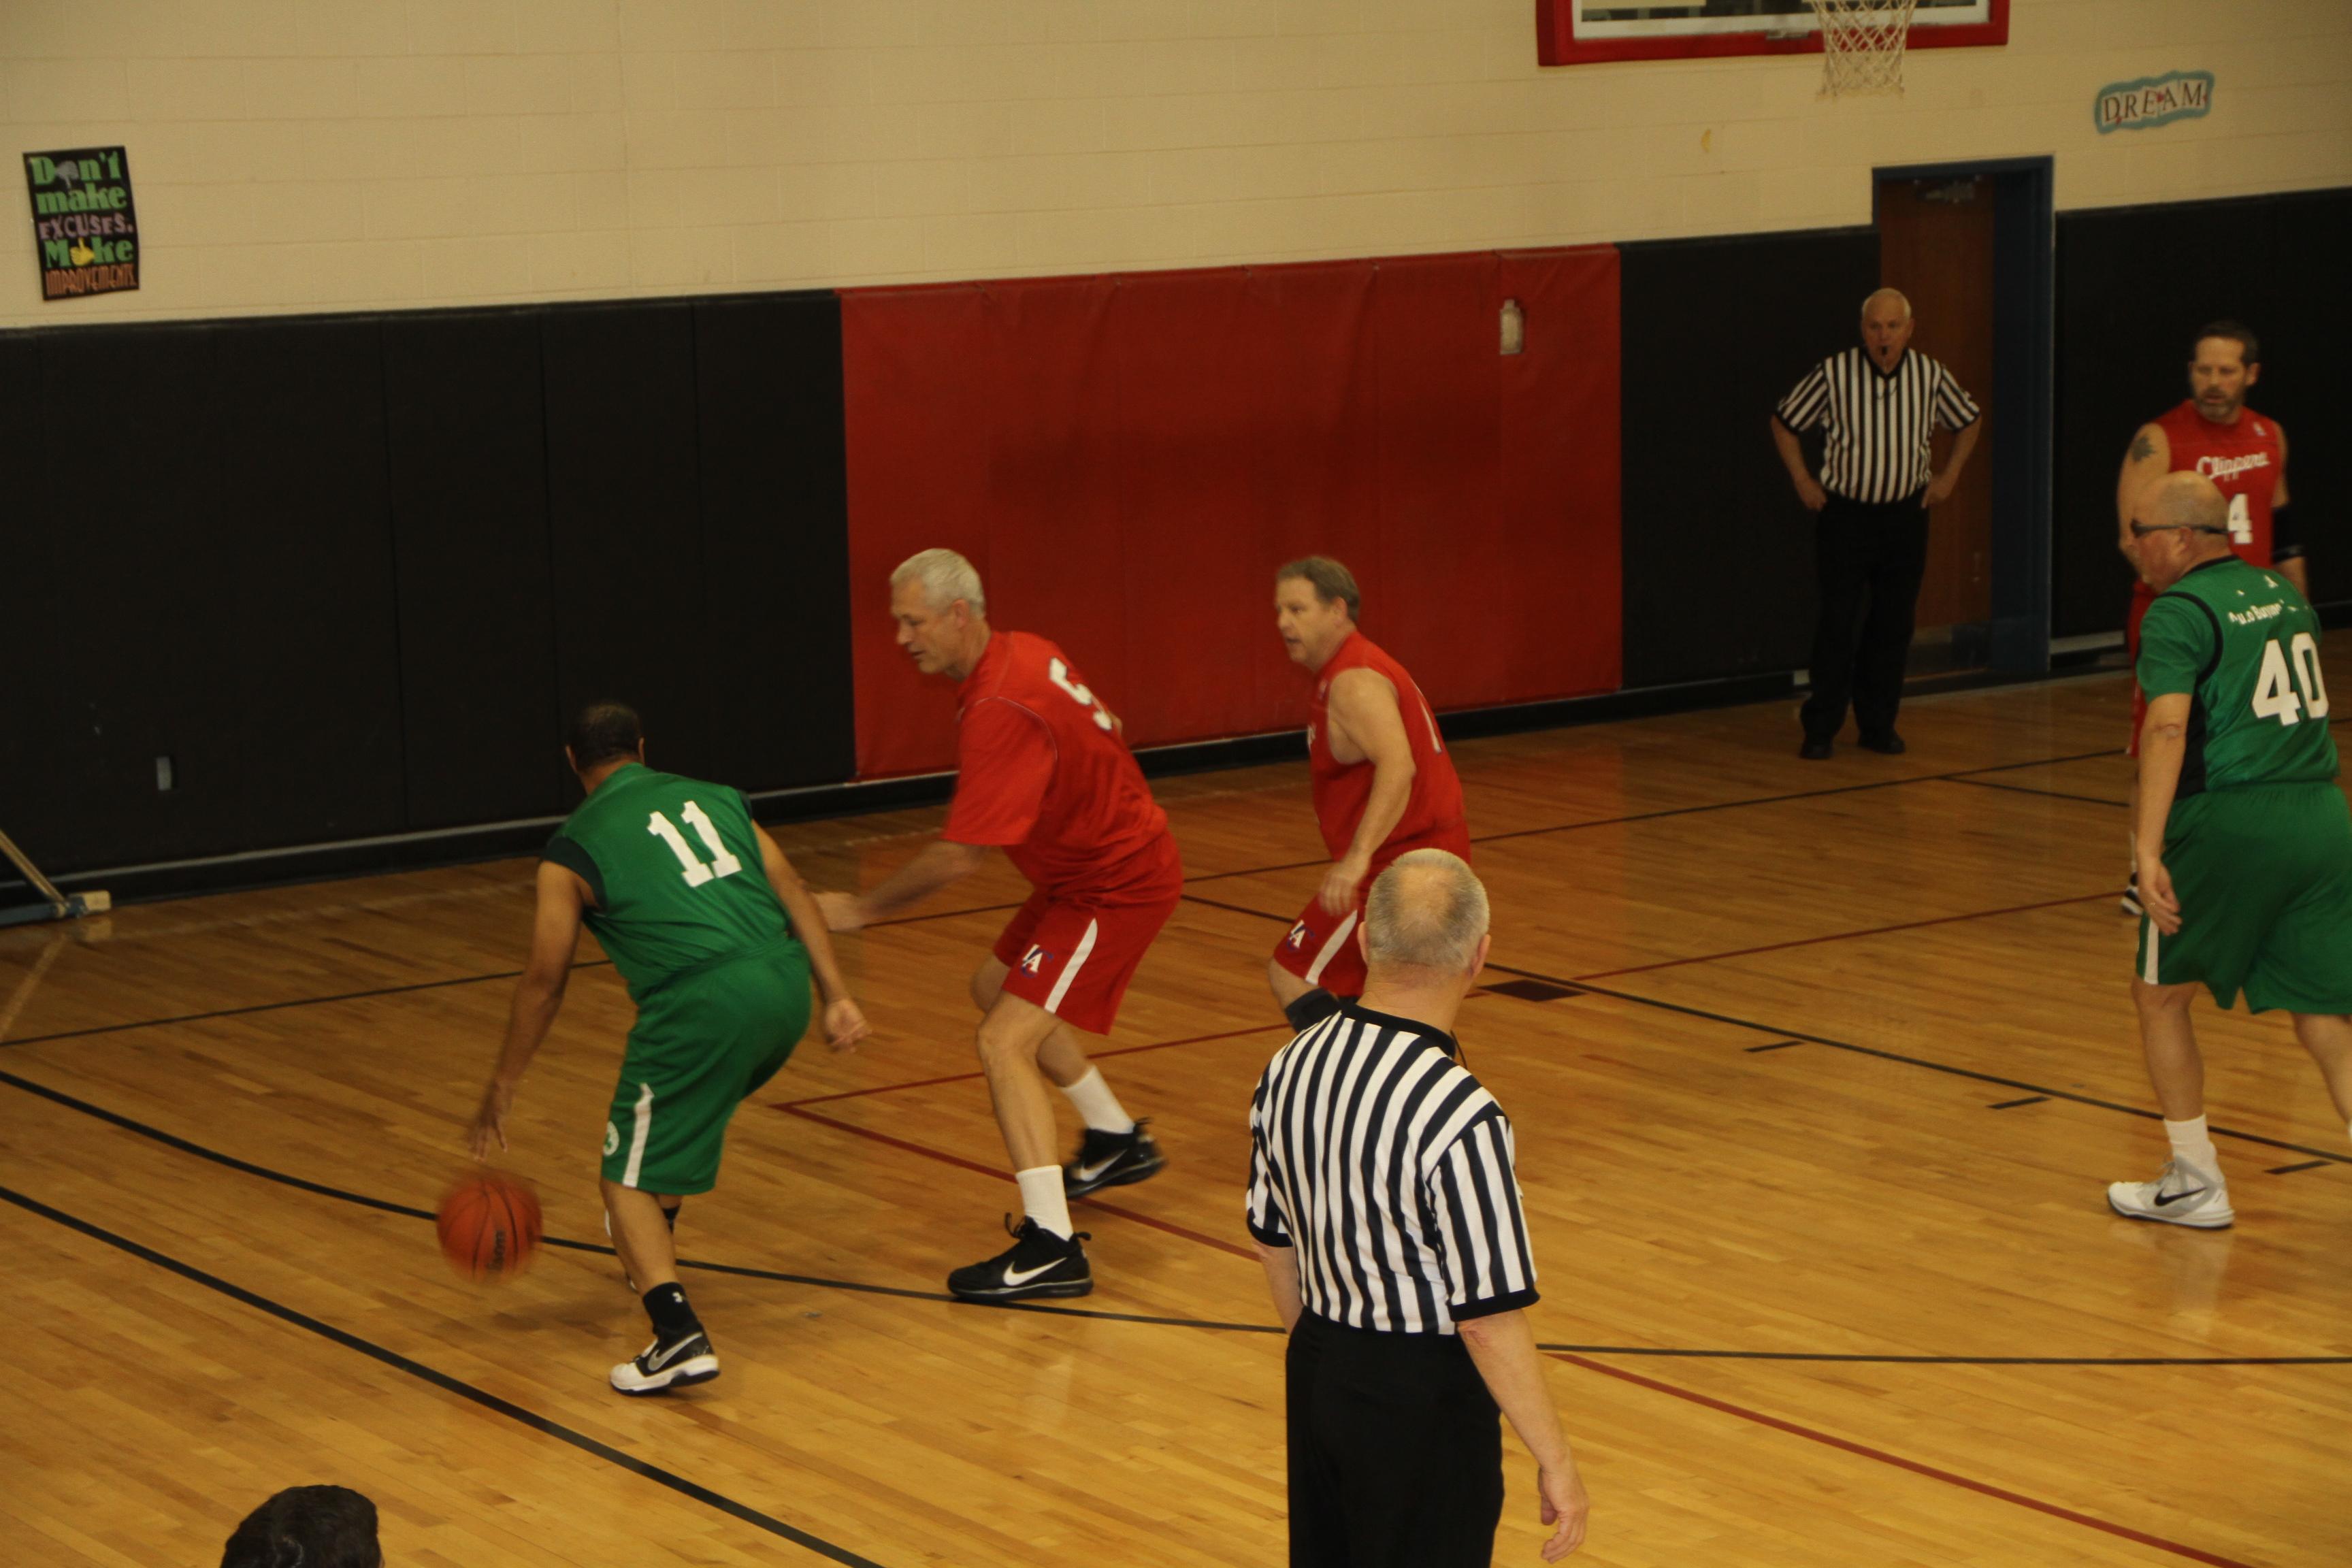 NBA action shots 2